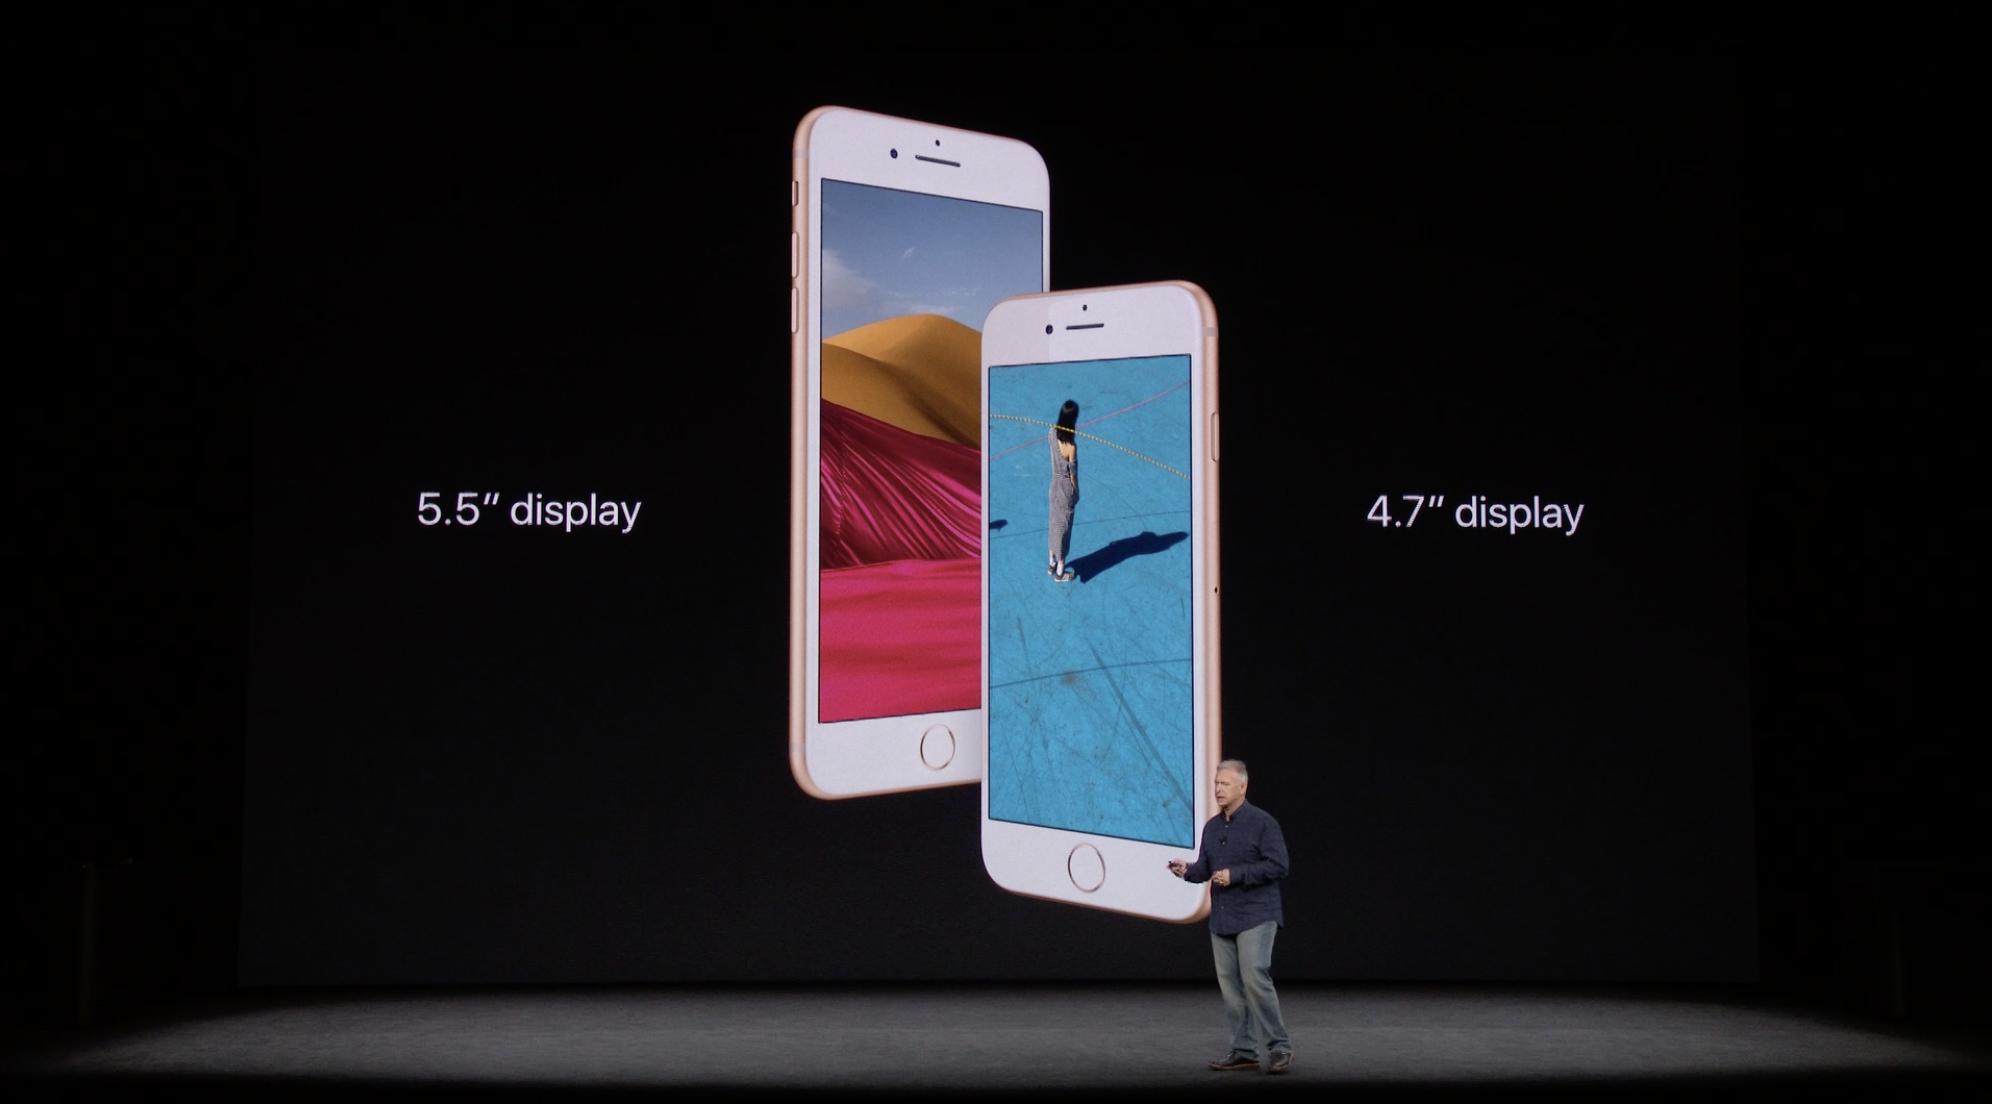 Retina Display sizes